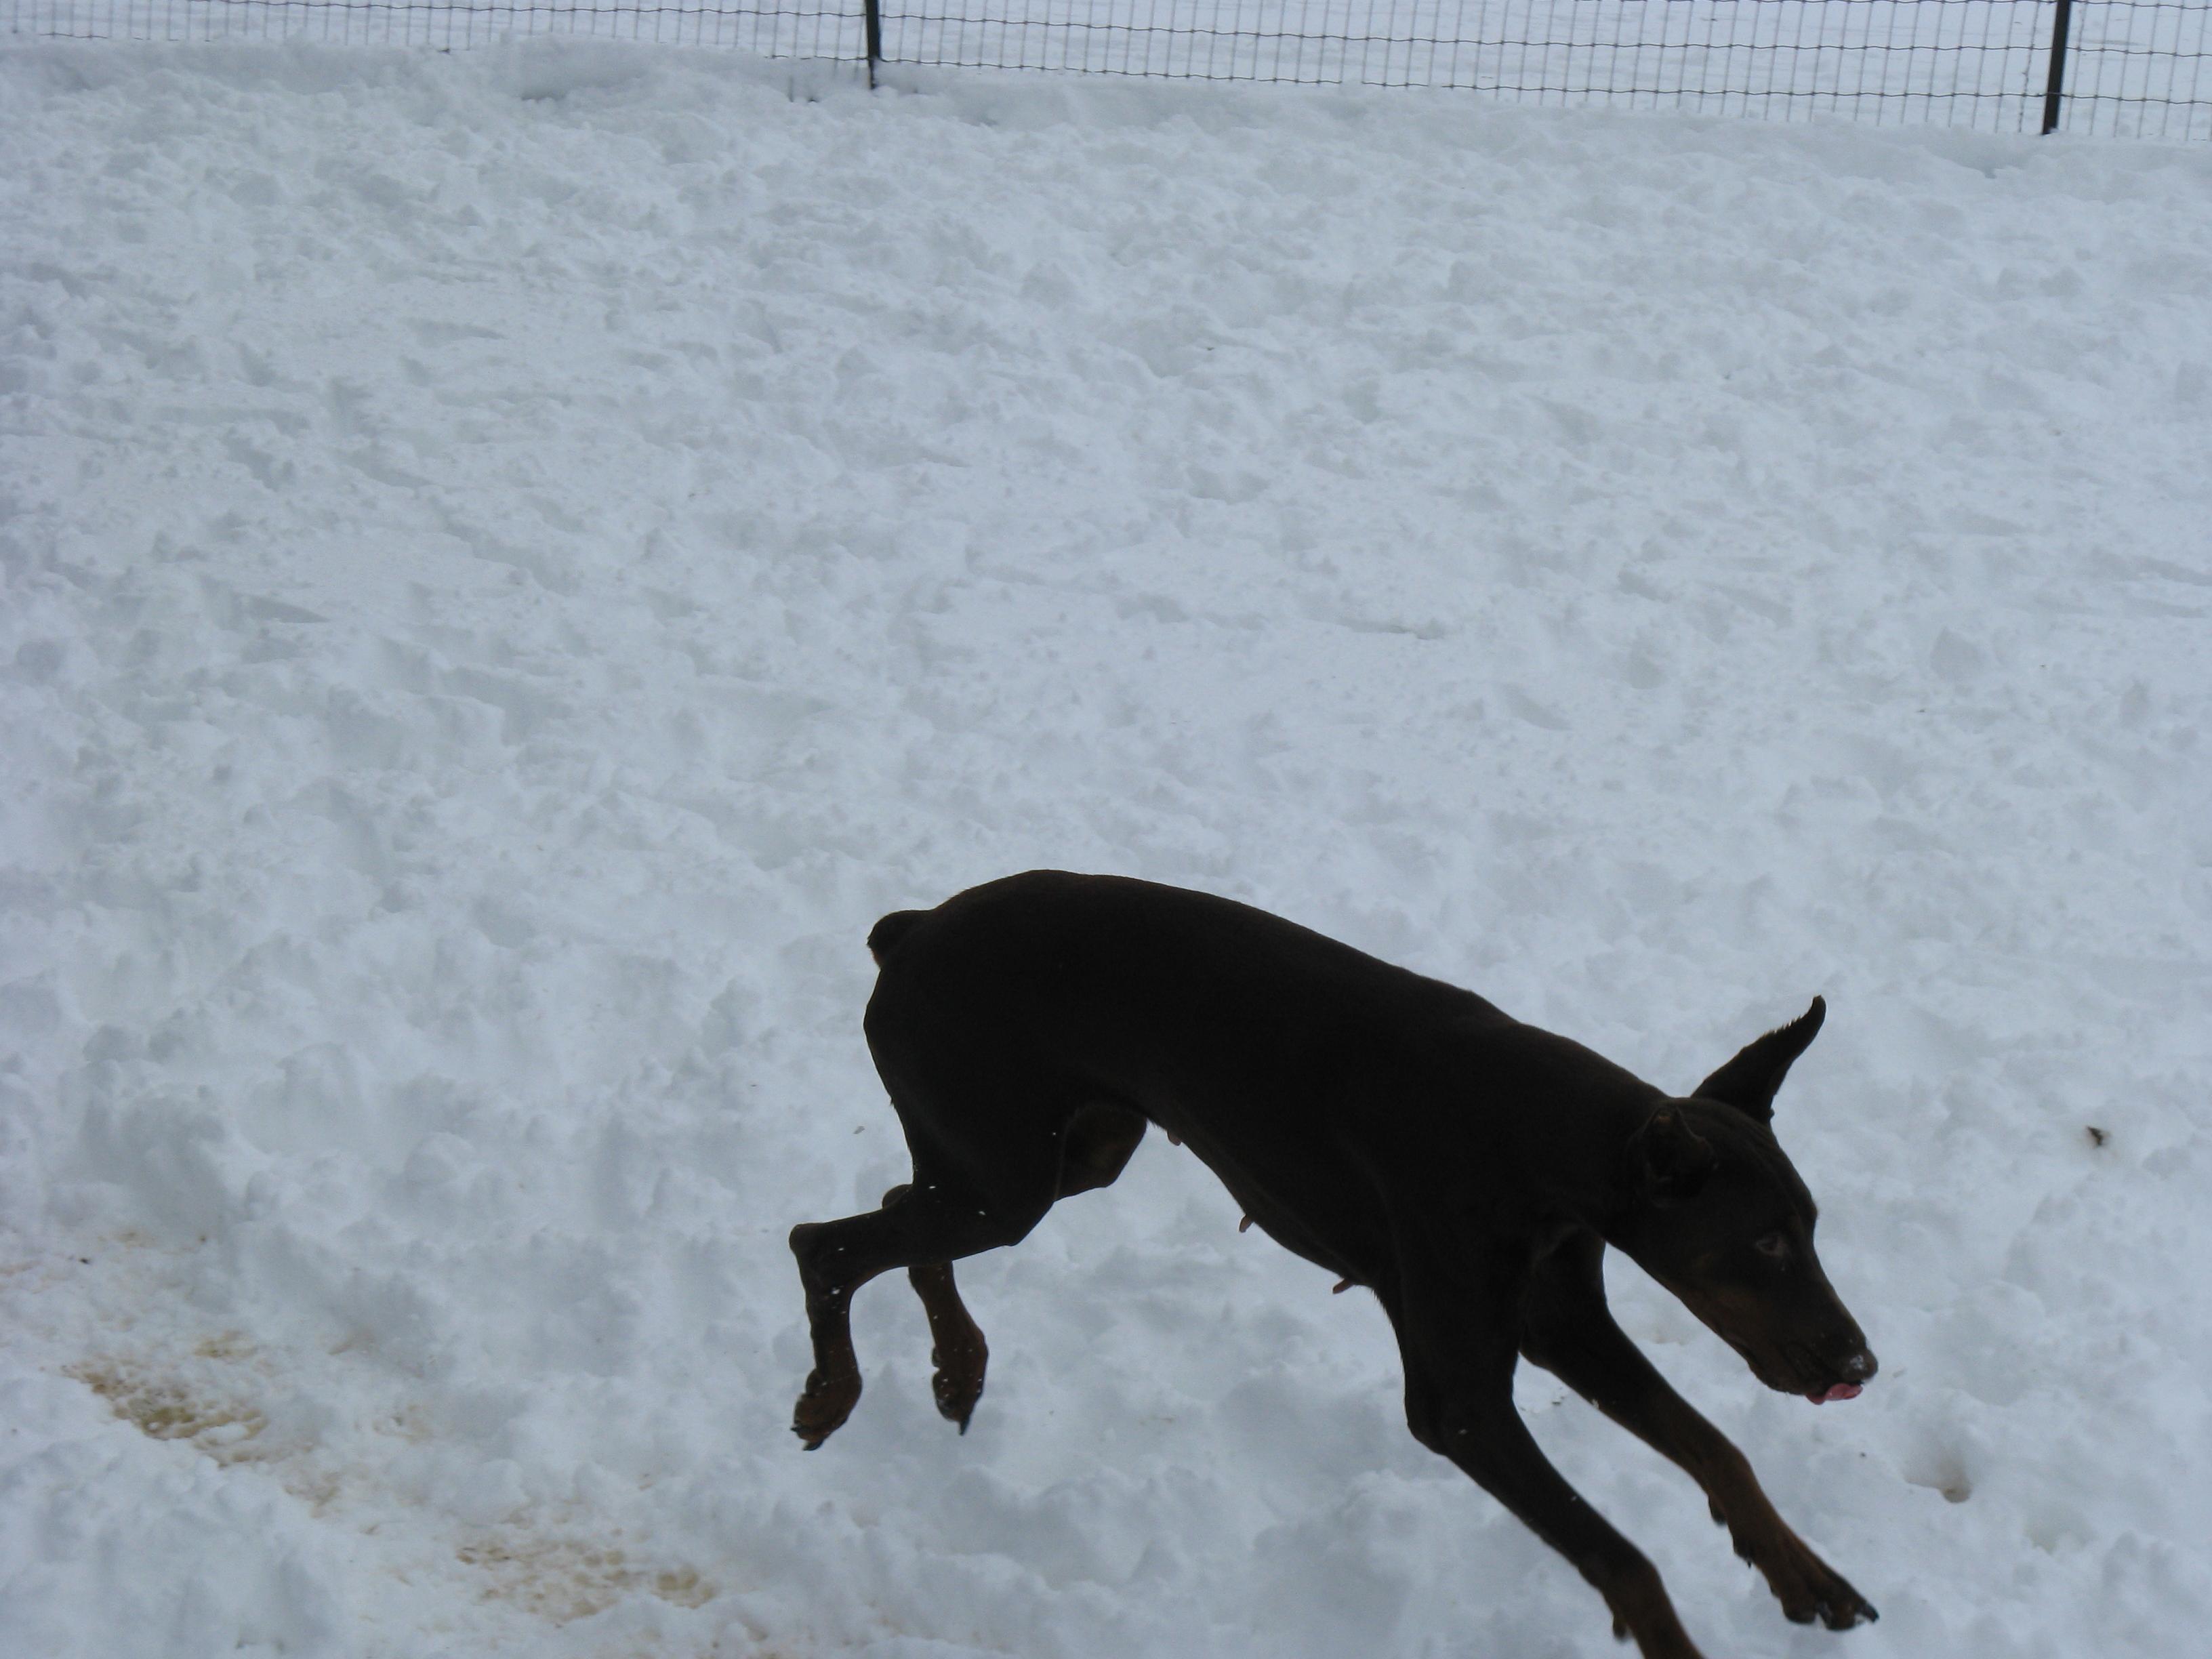 Snow+Day+037.JPG